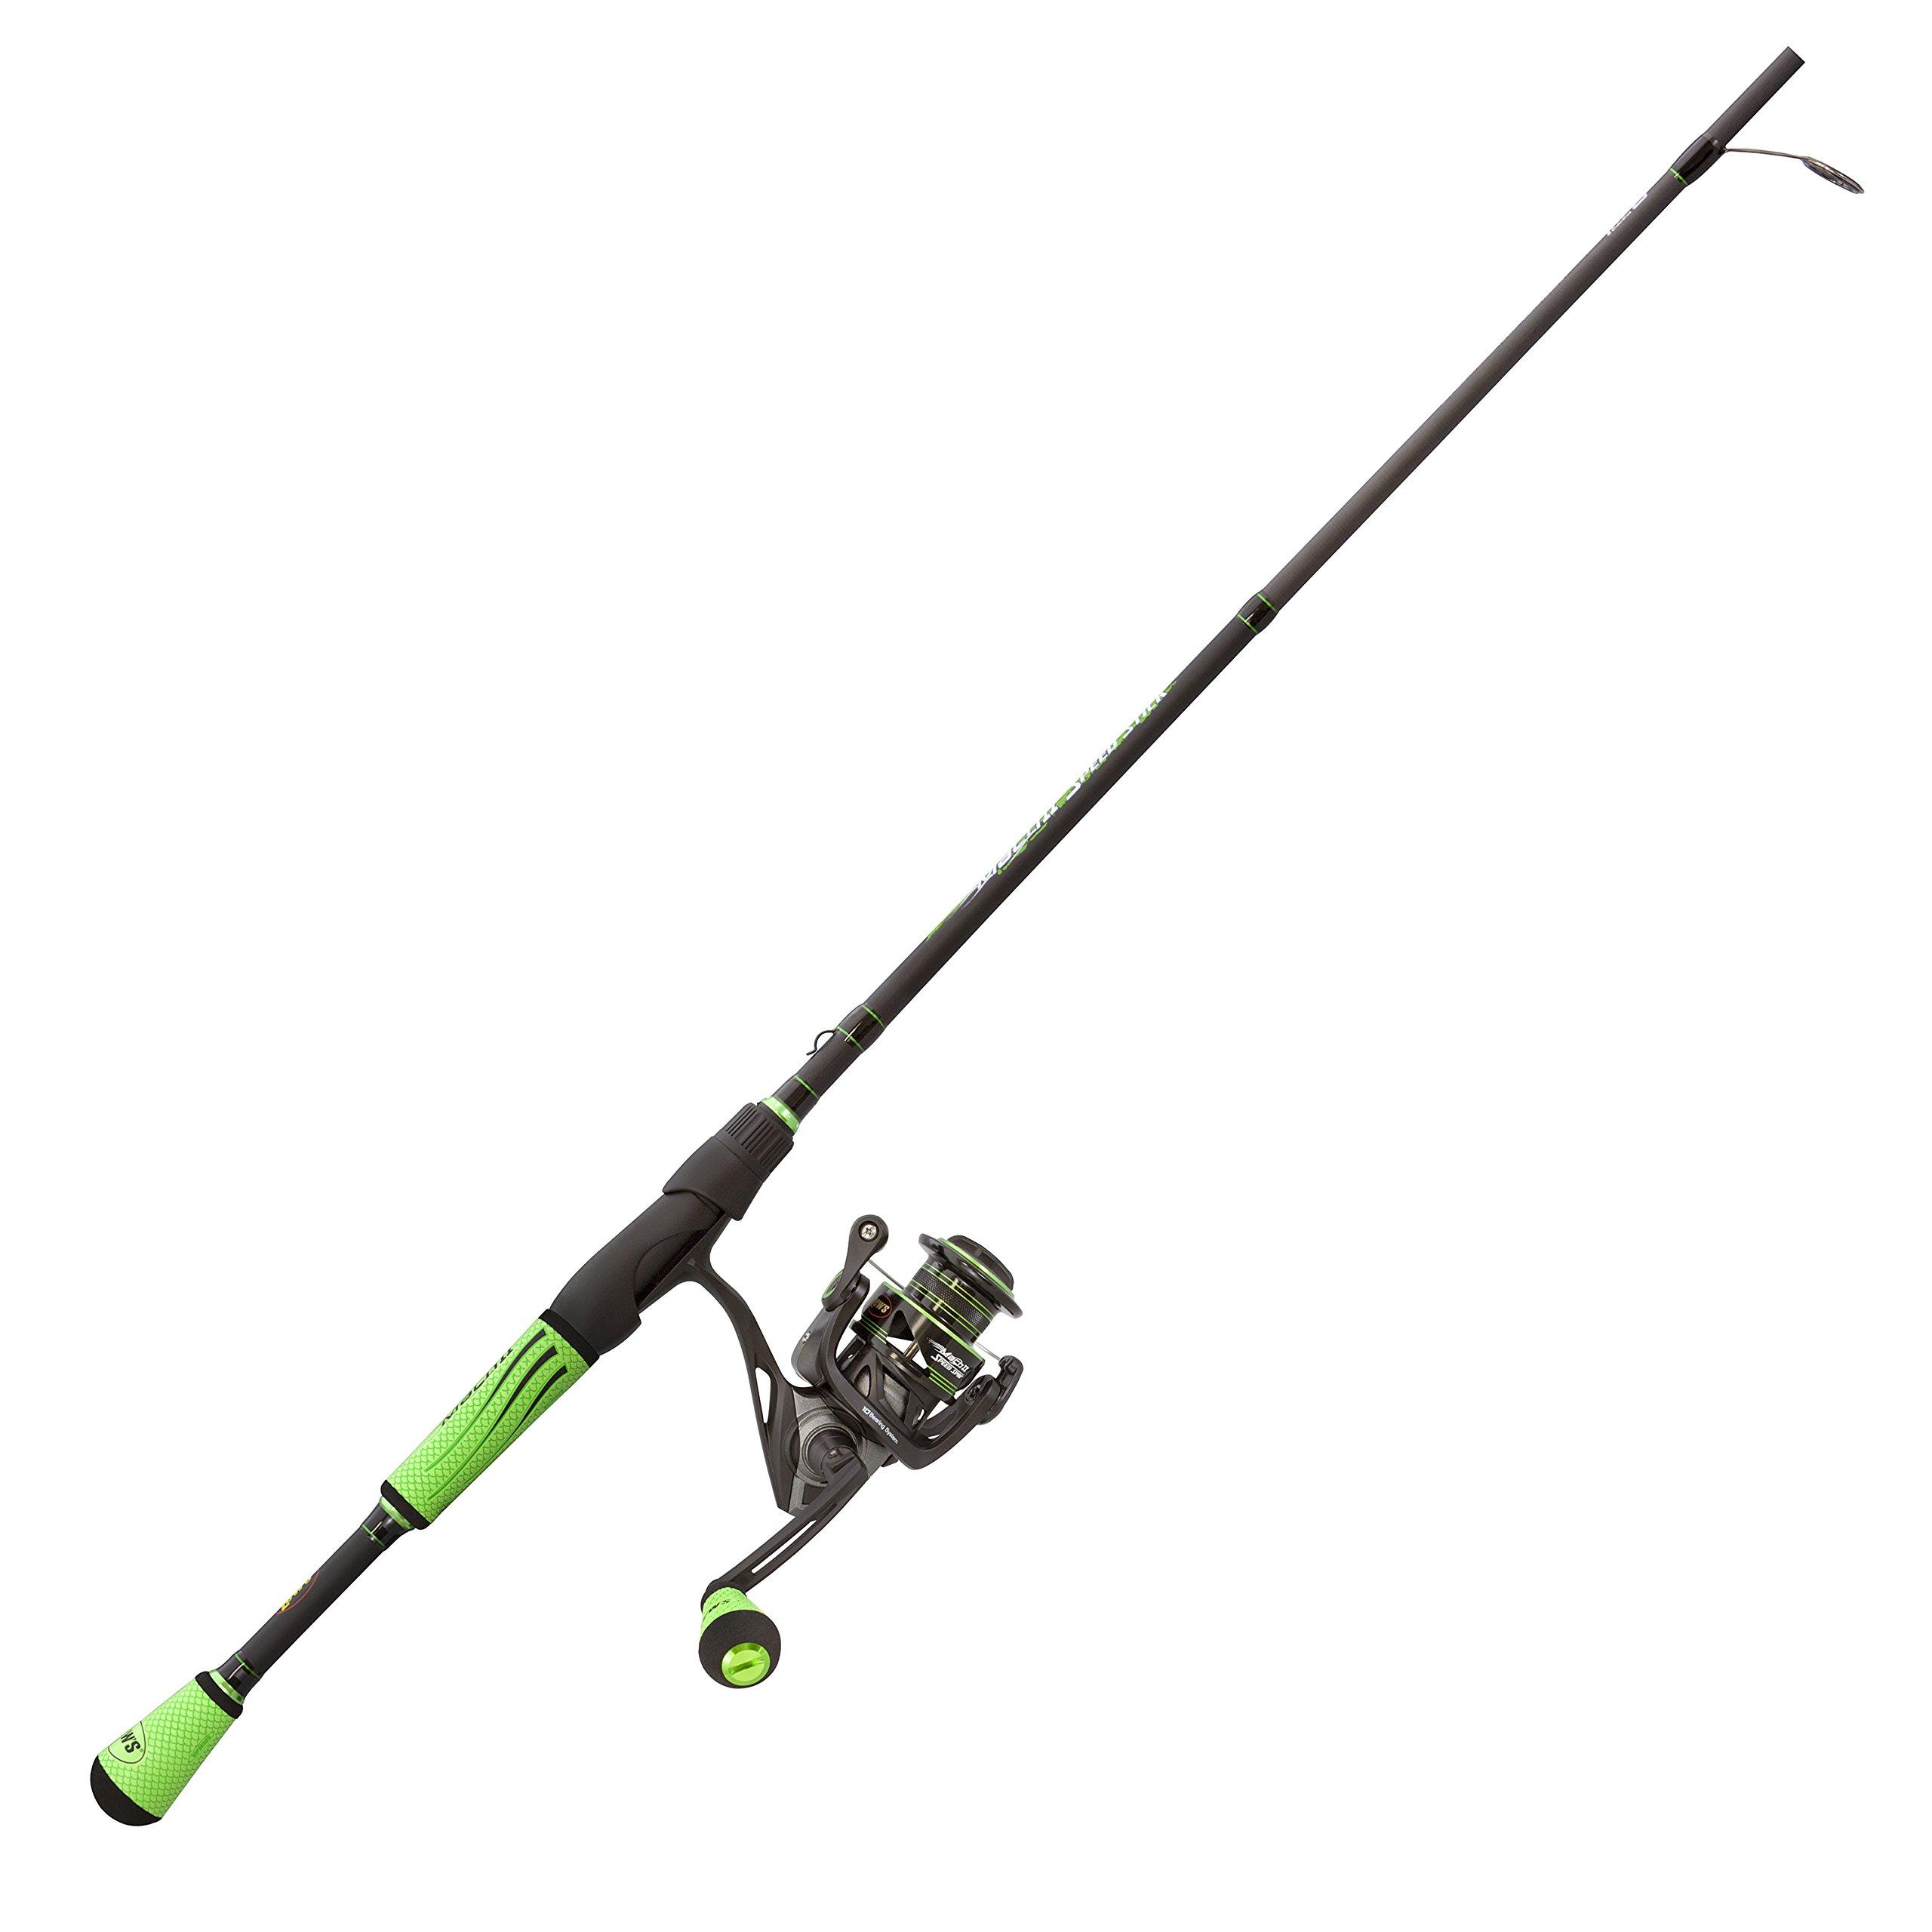 Lew's Fishing M23069MFS Lews Fishing, Mach II Spinning Combo, 6.2: 1 Gear Ratio, 10 Bearings, 6'9'' 1Piece, Medium/Fast Power. Ambidextrous